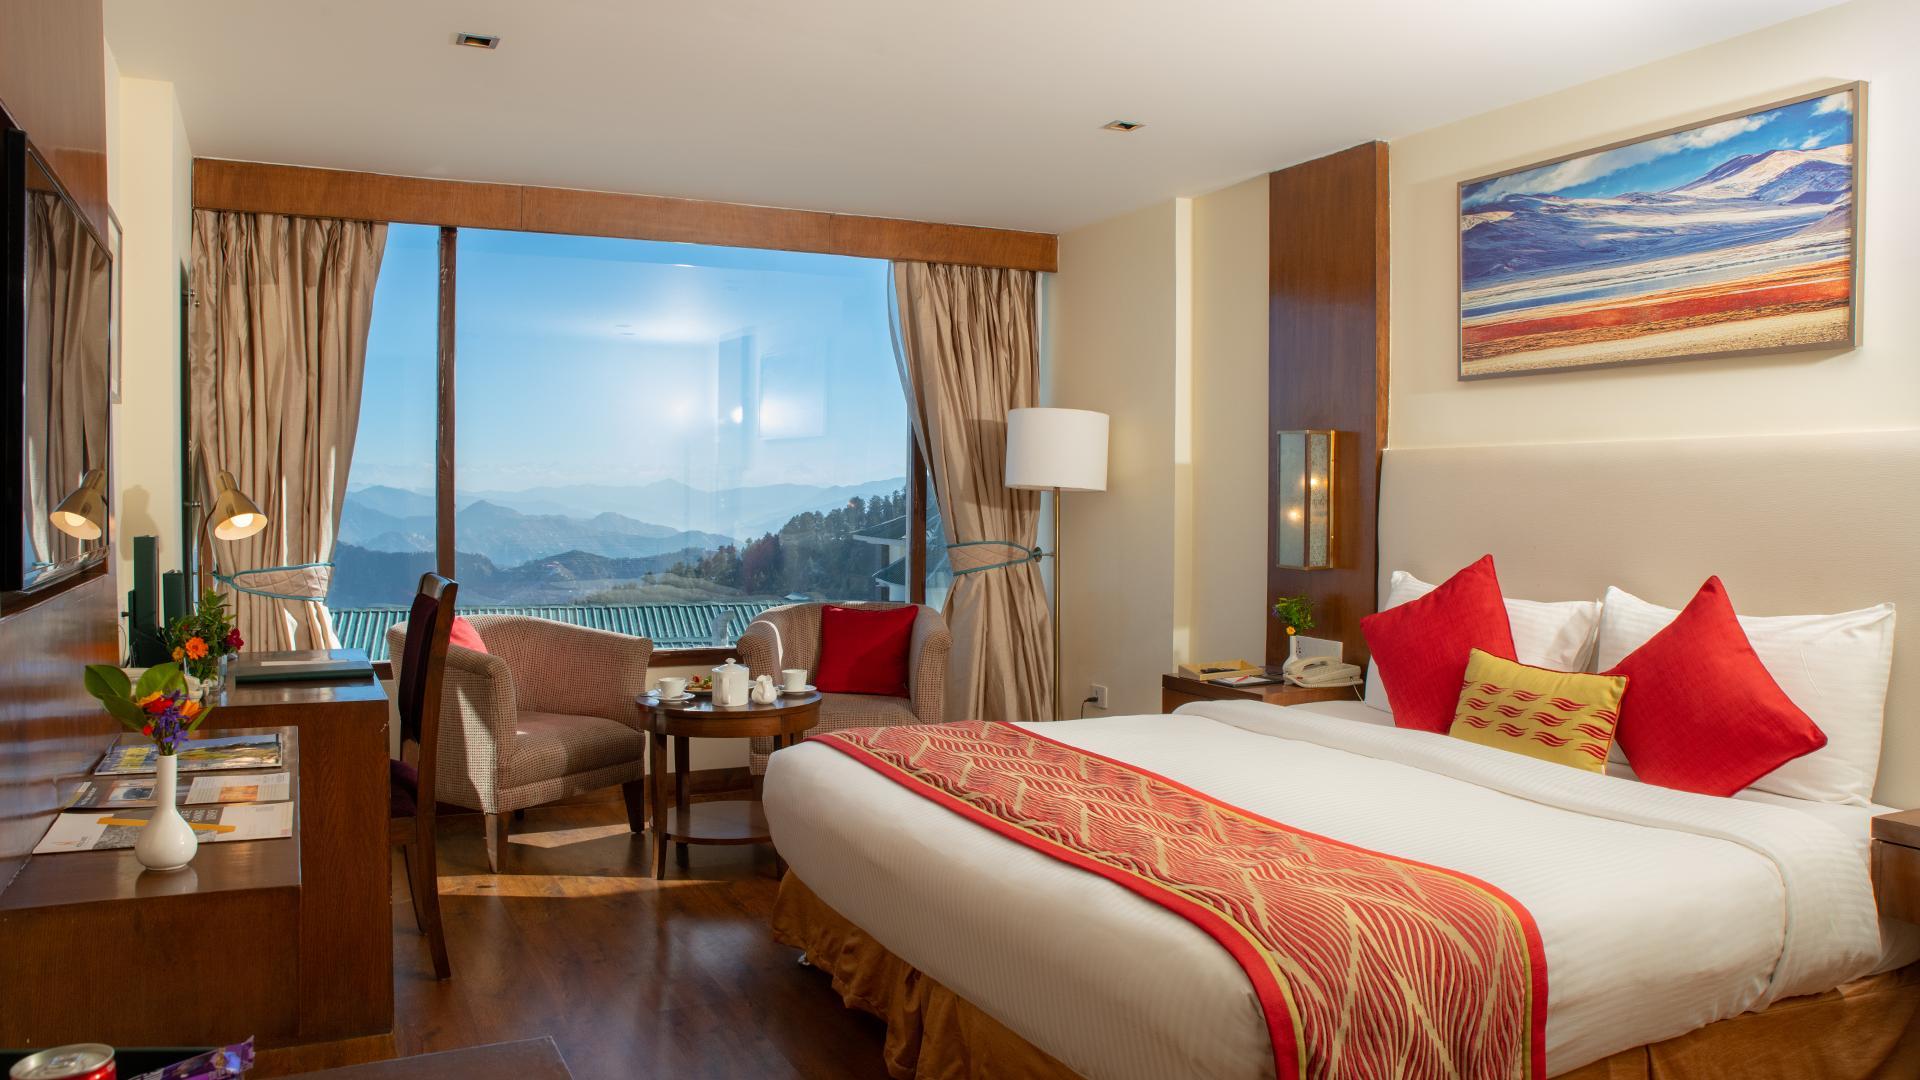 Deluxe Room image 1 at Royal Tulip Shimla, Kufri Hills by Shimla, Himachal Pradesh, India